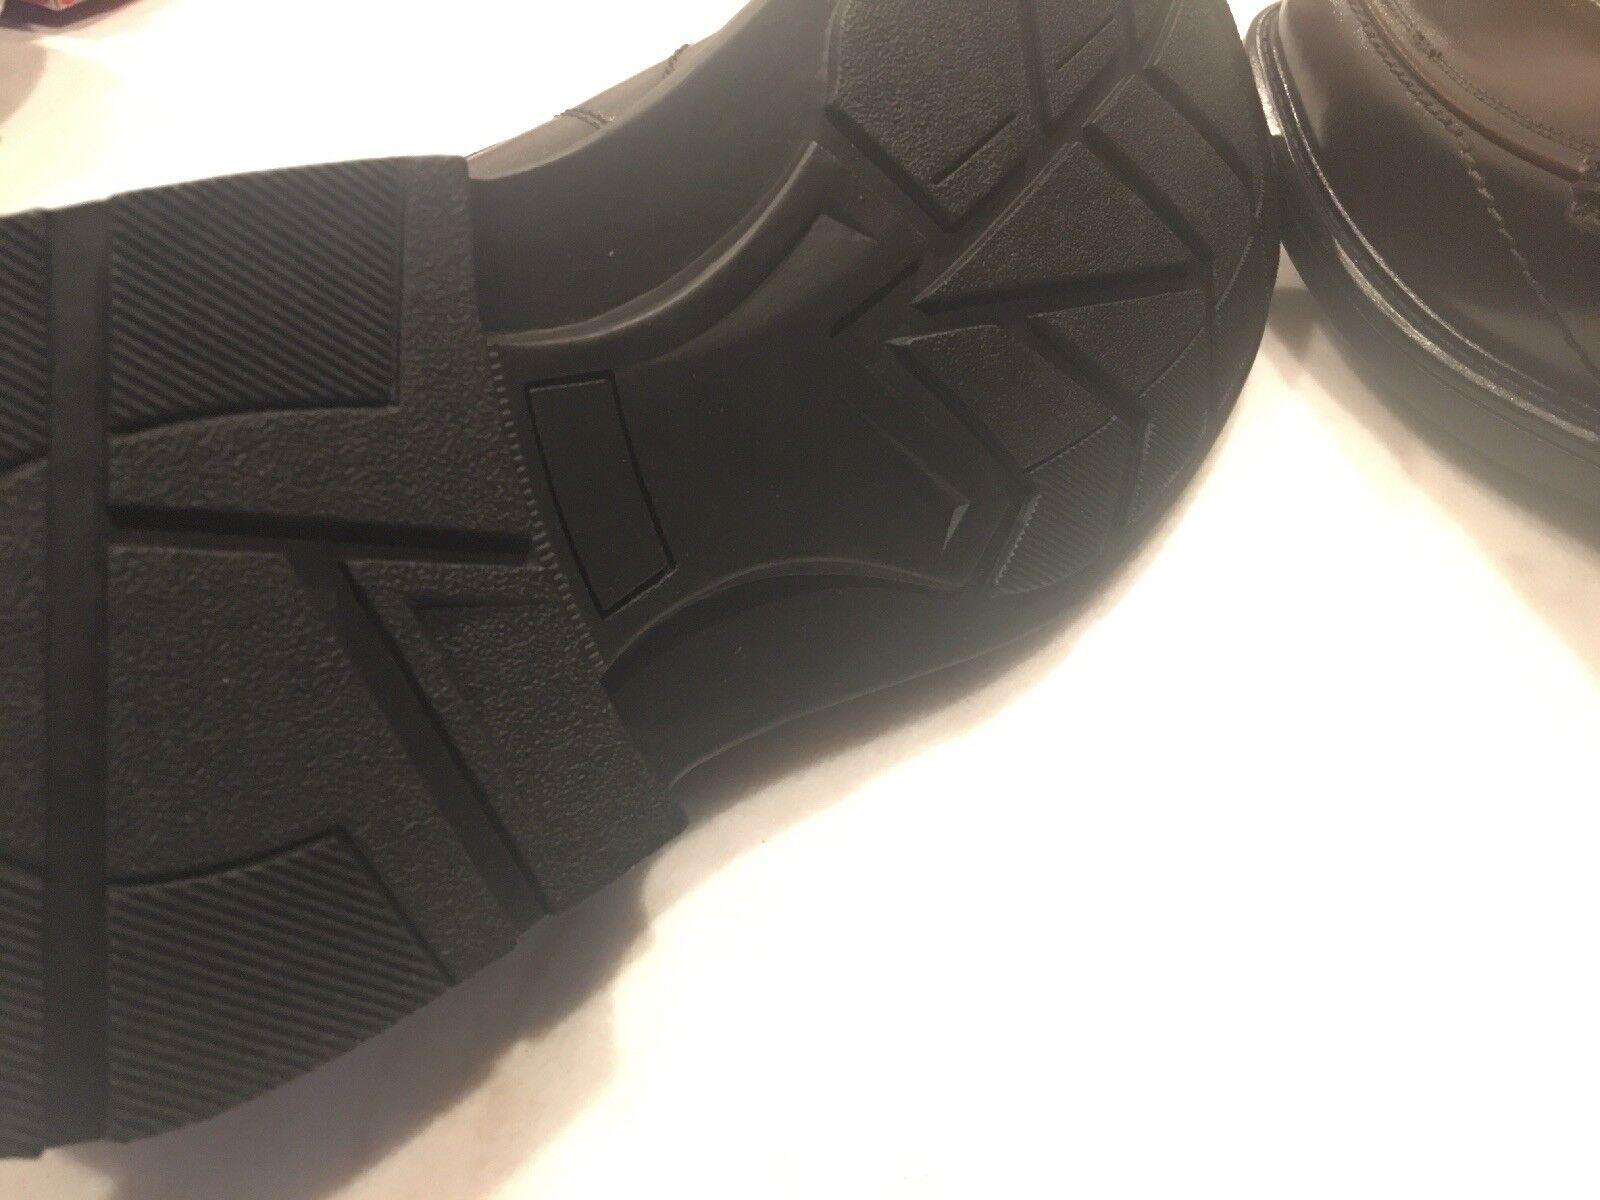 Via Europa Men's Leather Scranton braun Dress schuhe schuhe schuhe Größe 12M New With Box 8c7c25